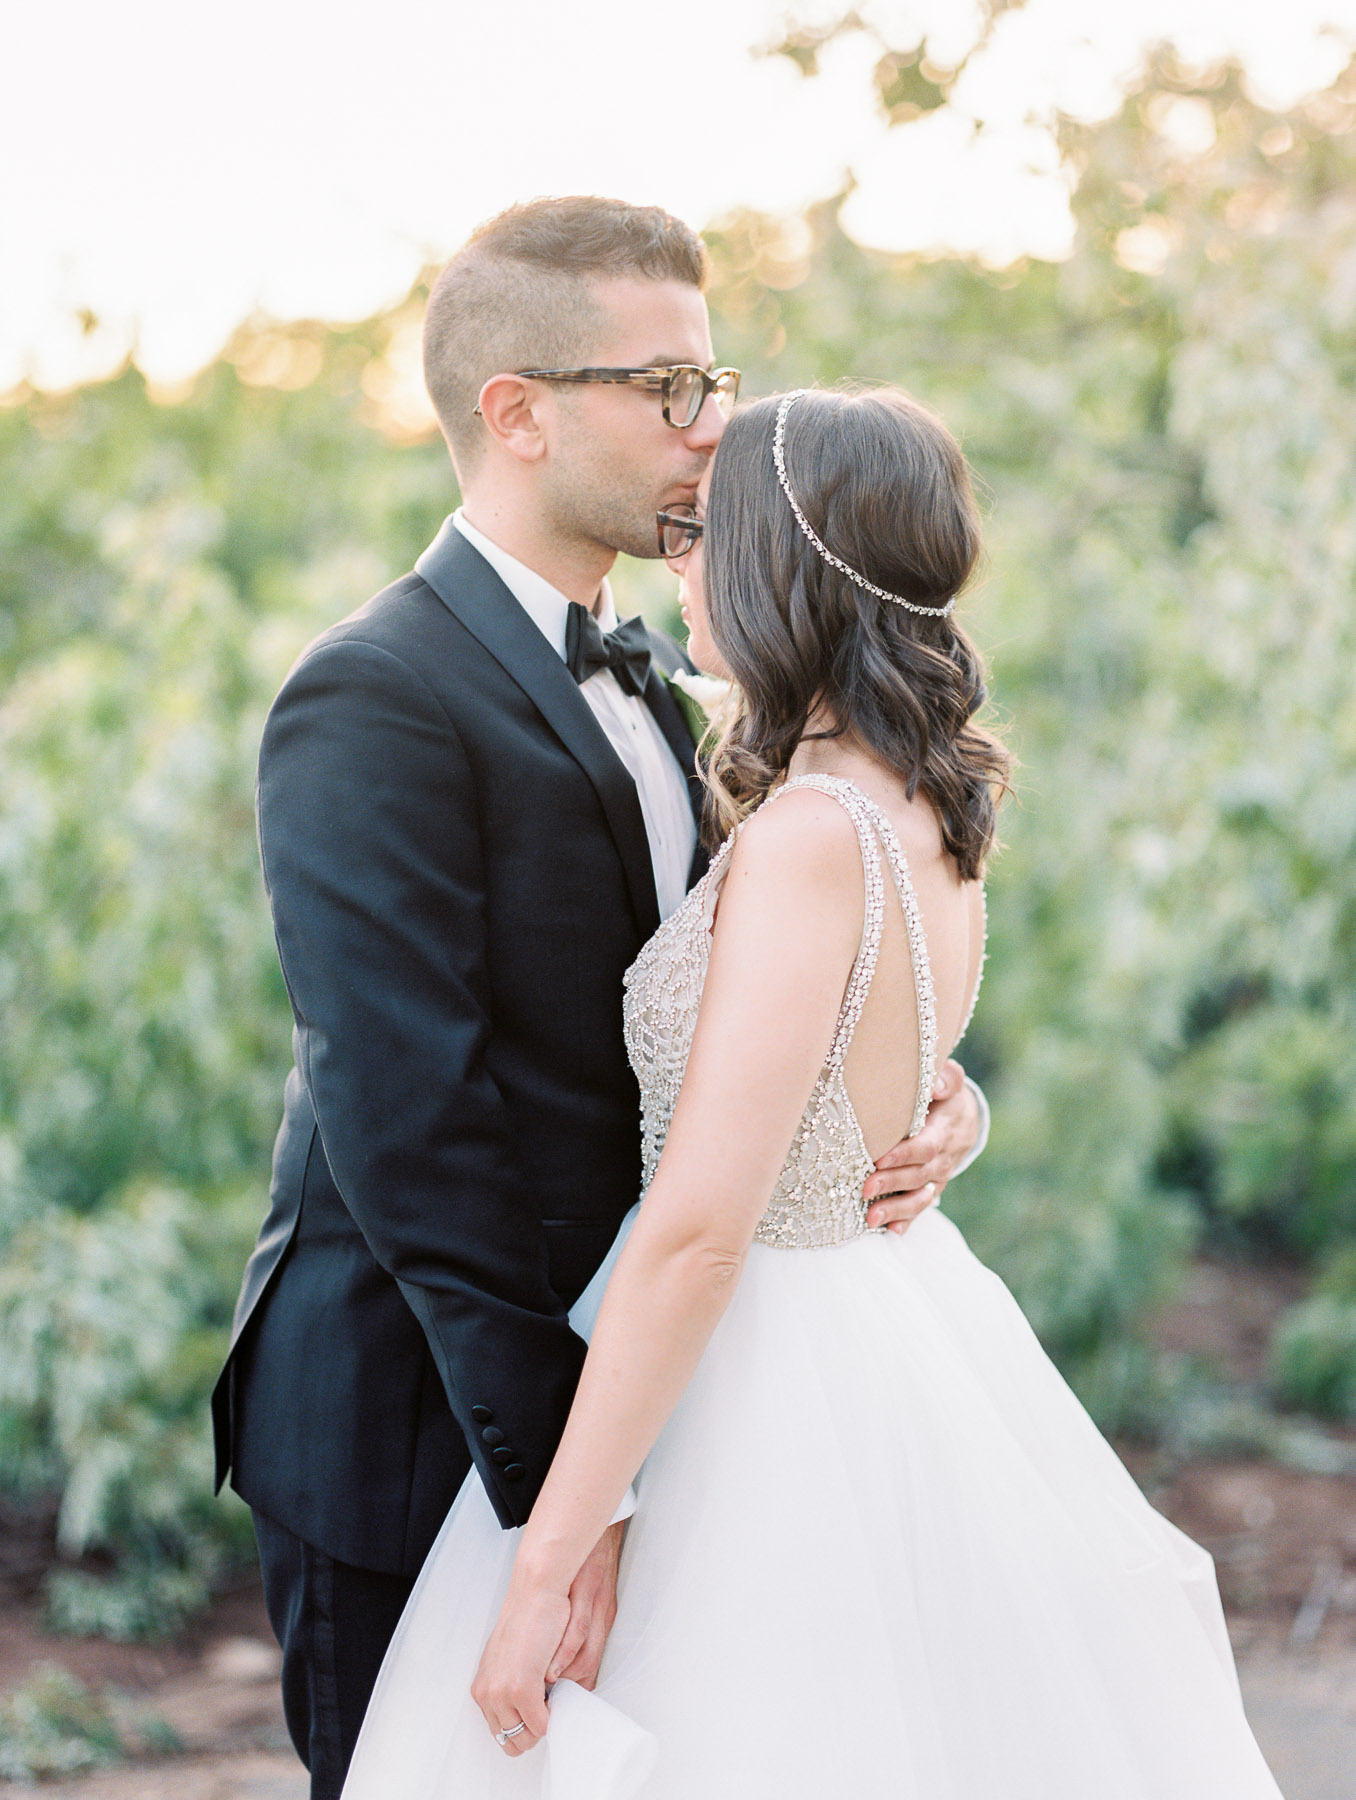 NJ Wedding Photography at The Ryland Inn